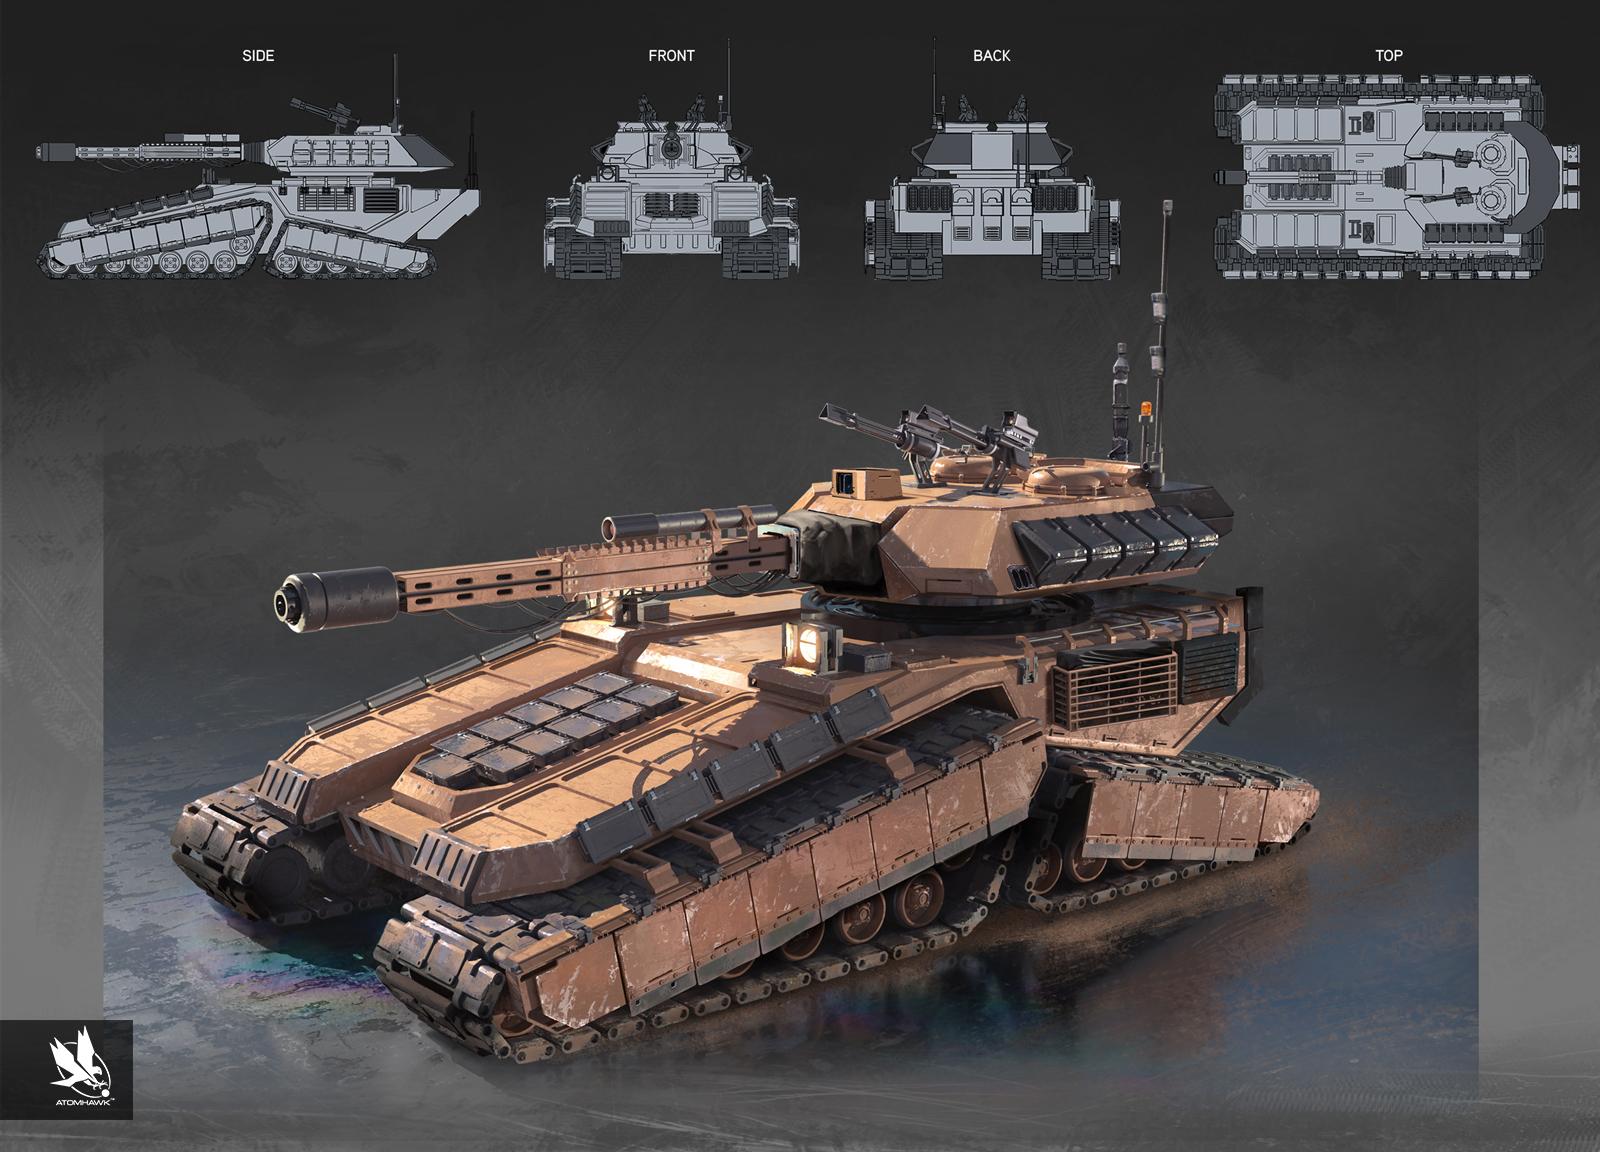 Atomhawk_Warner-Bros-NetherRealm_Mortal-Kombat-11_Concept-Art_Prop-Design_Tank_Breakout.jpg